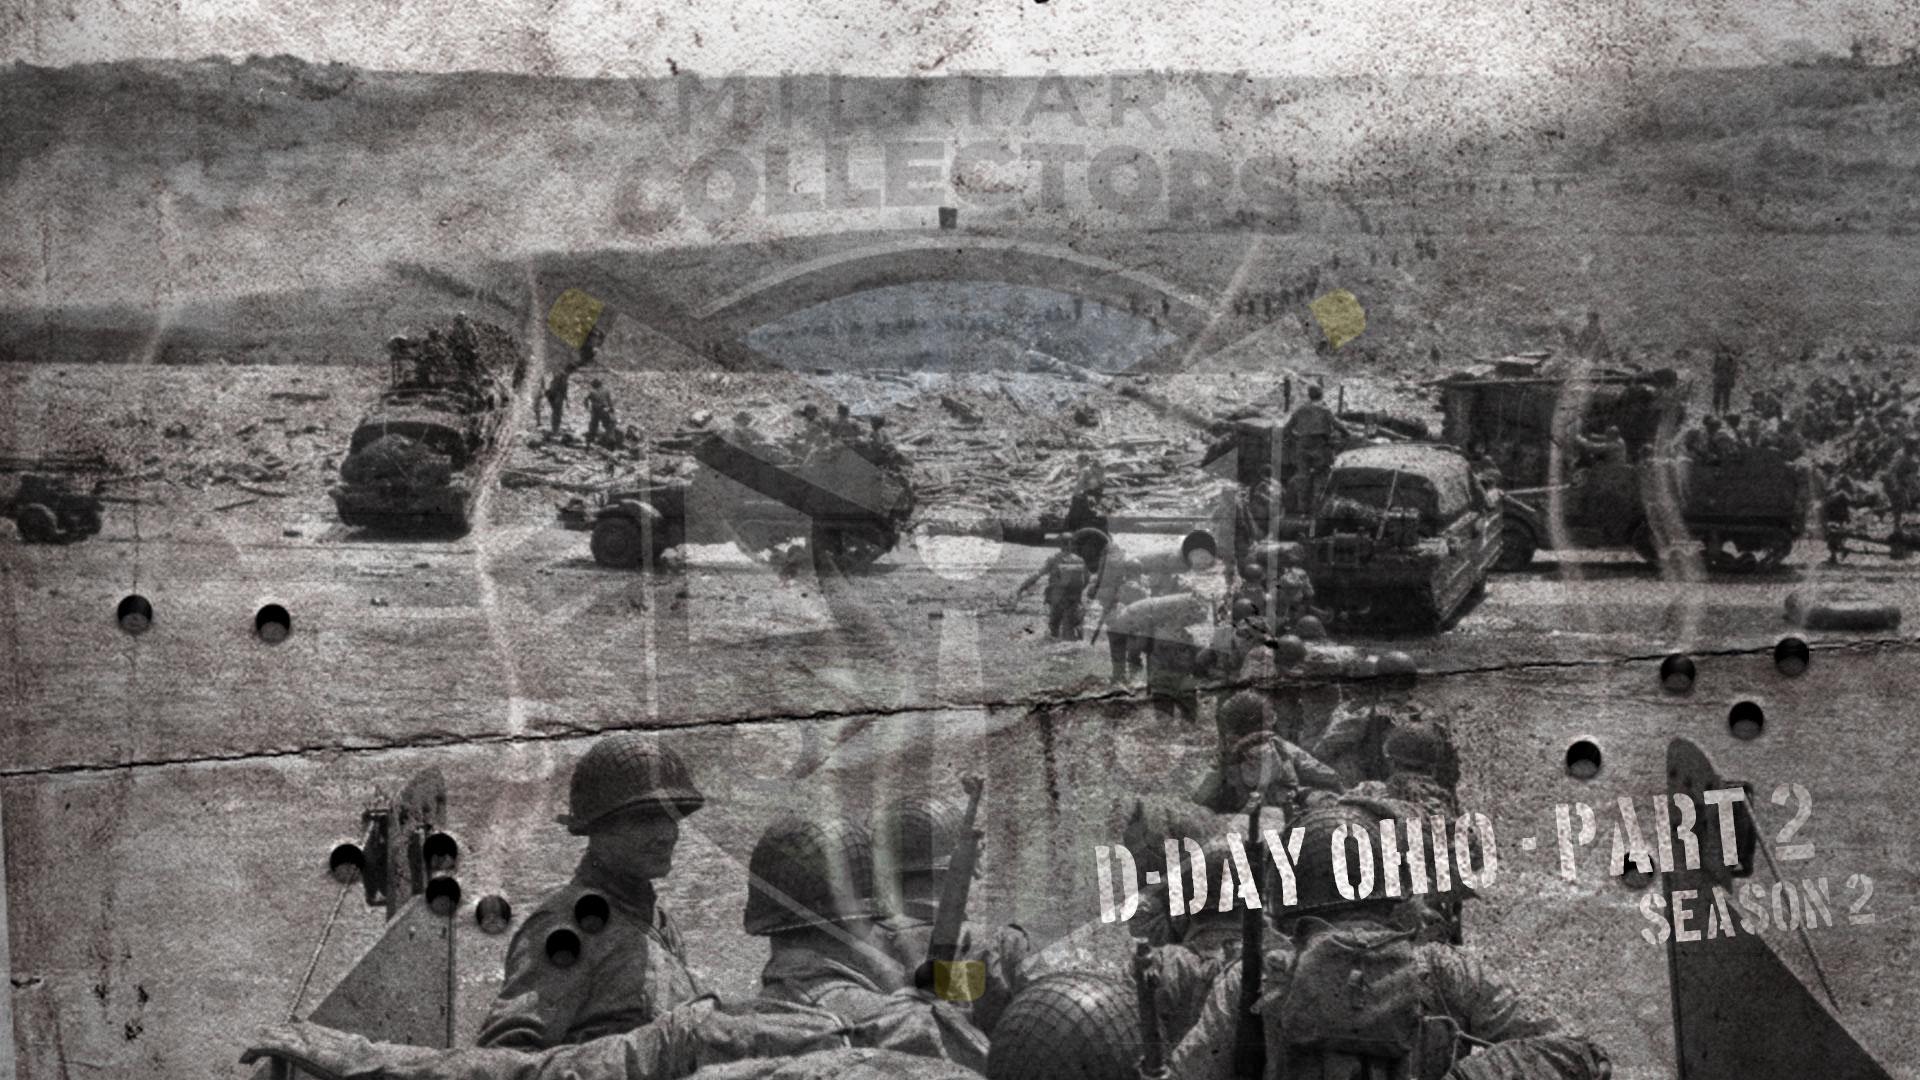 D-Day Ohio Part 2